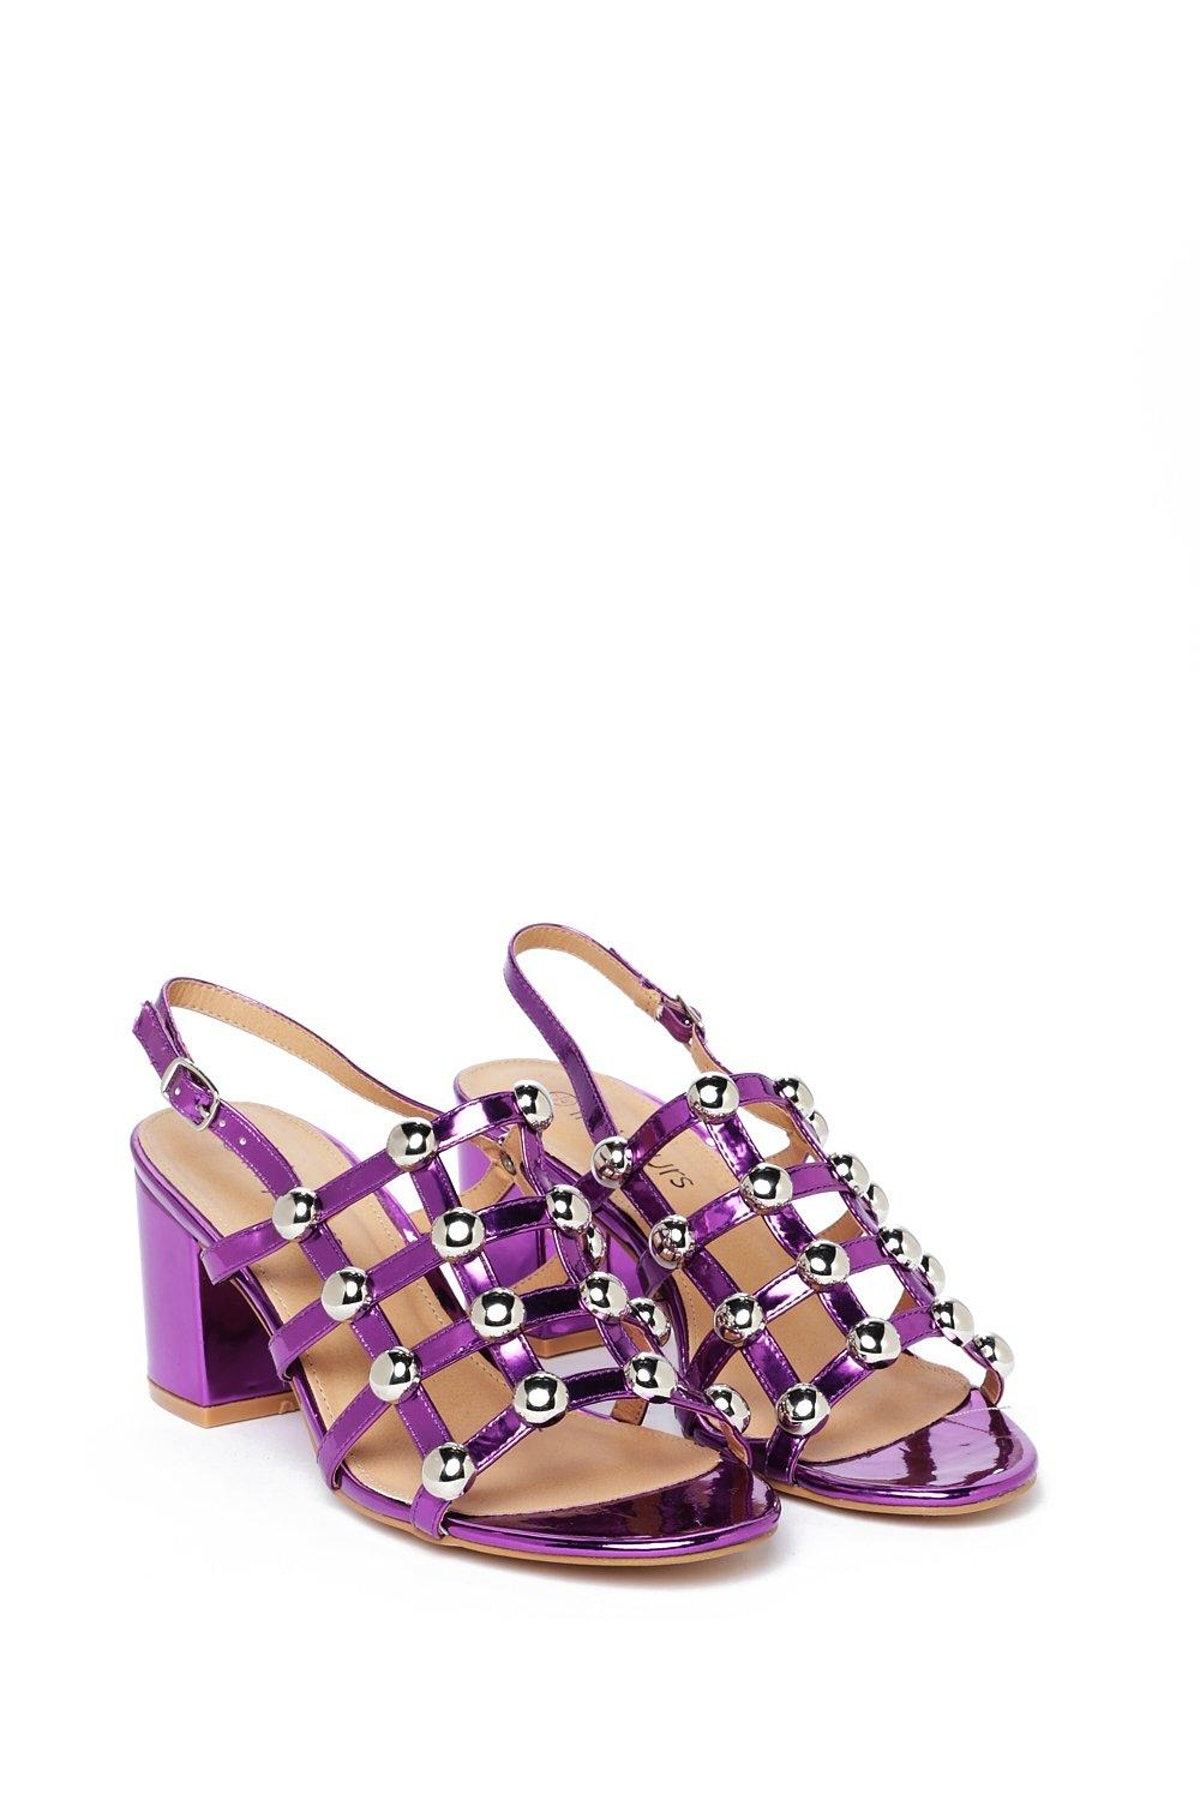 Friend of Shine Metallic Sandal